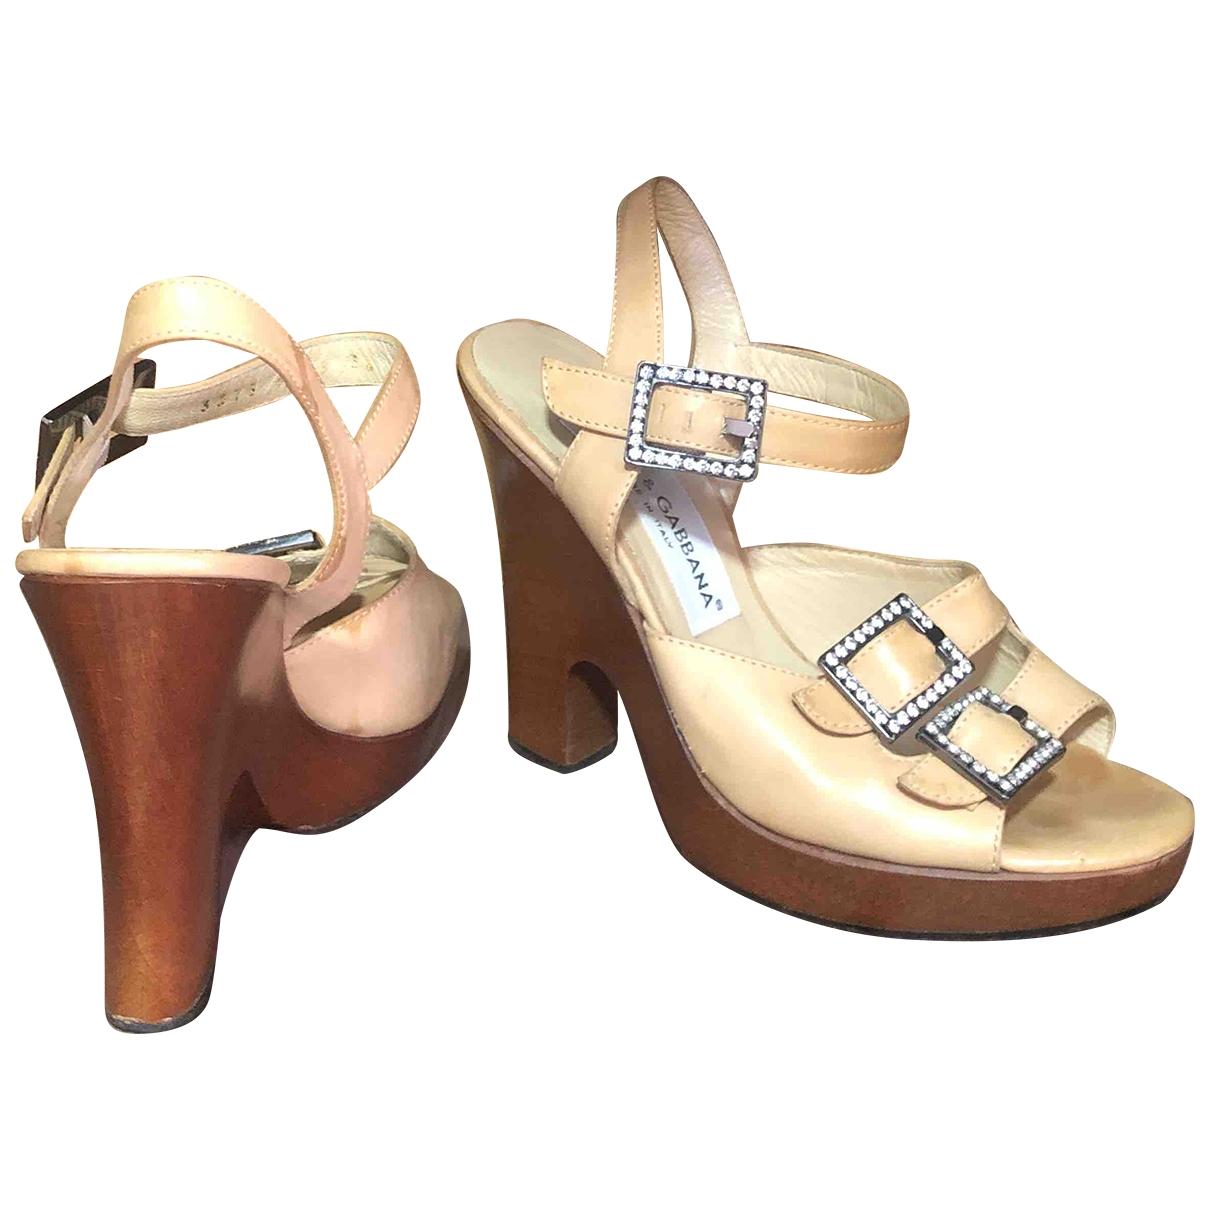 Dolce & Gabbana \N Sandalen in  Beige Leder